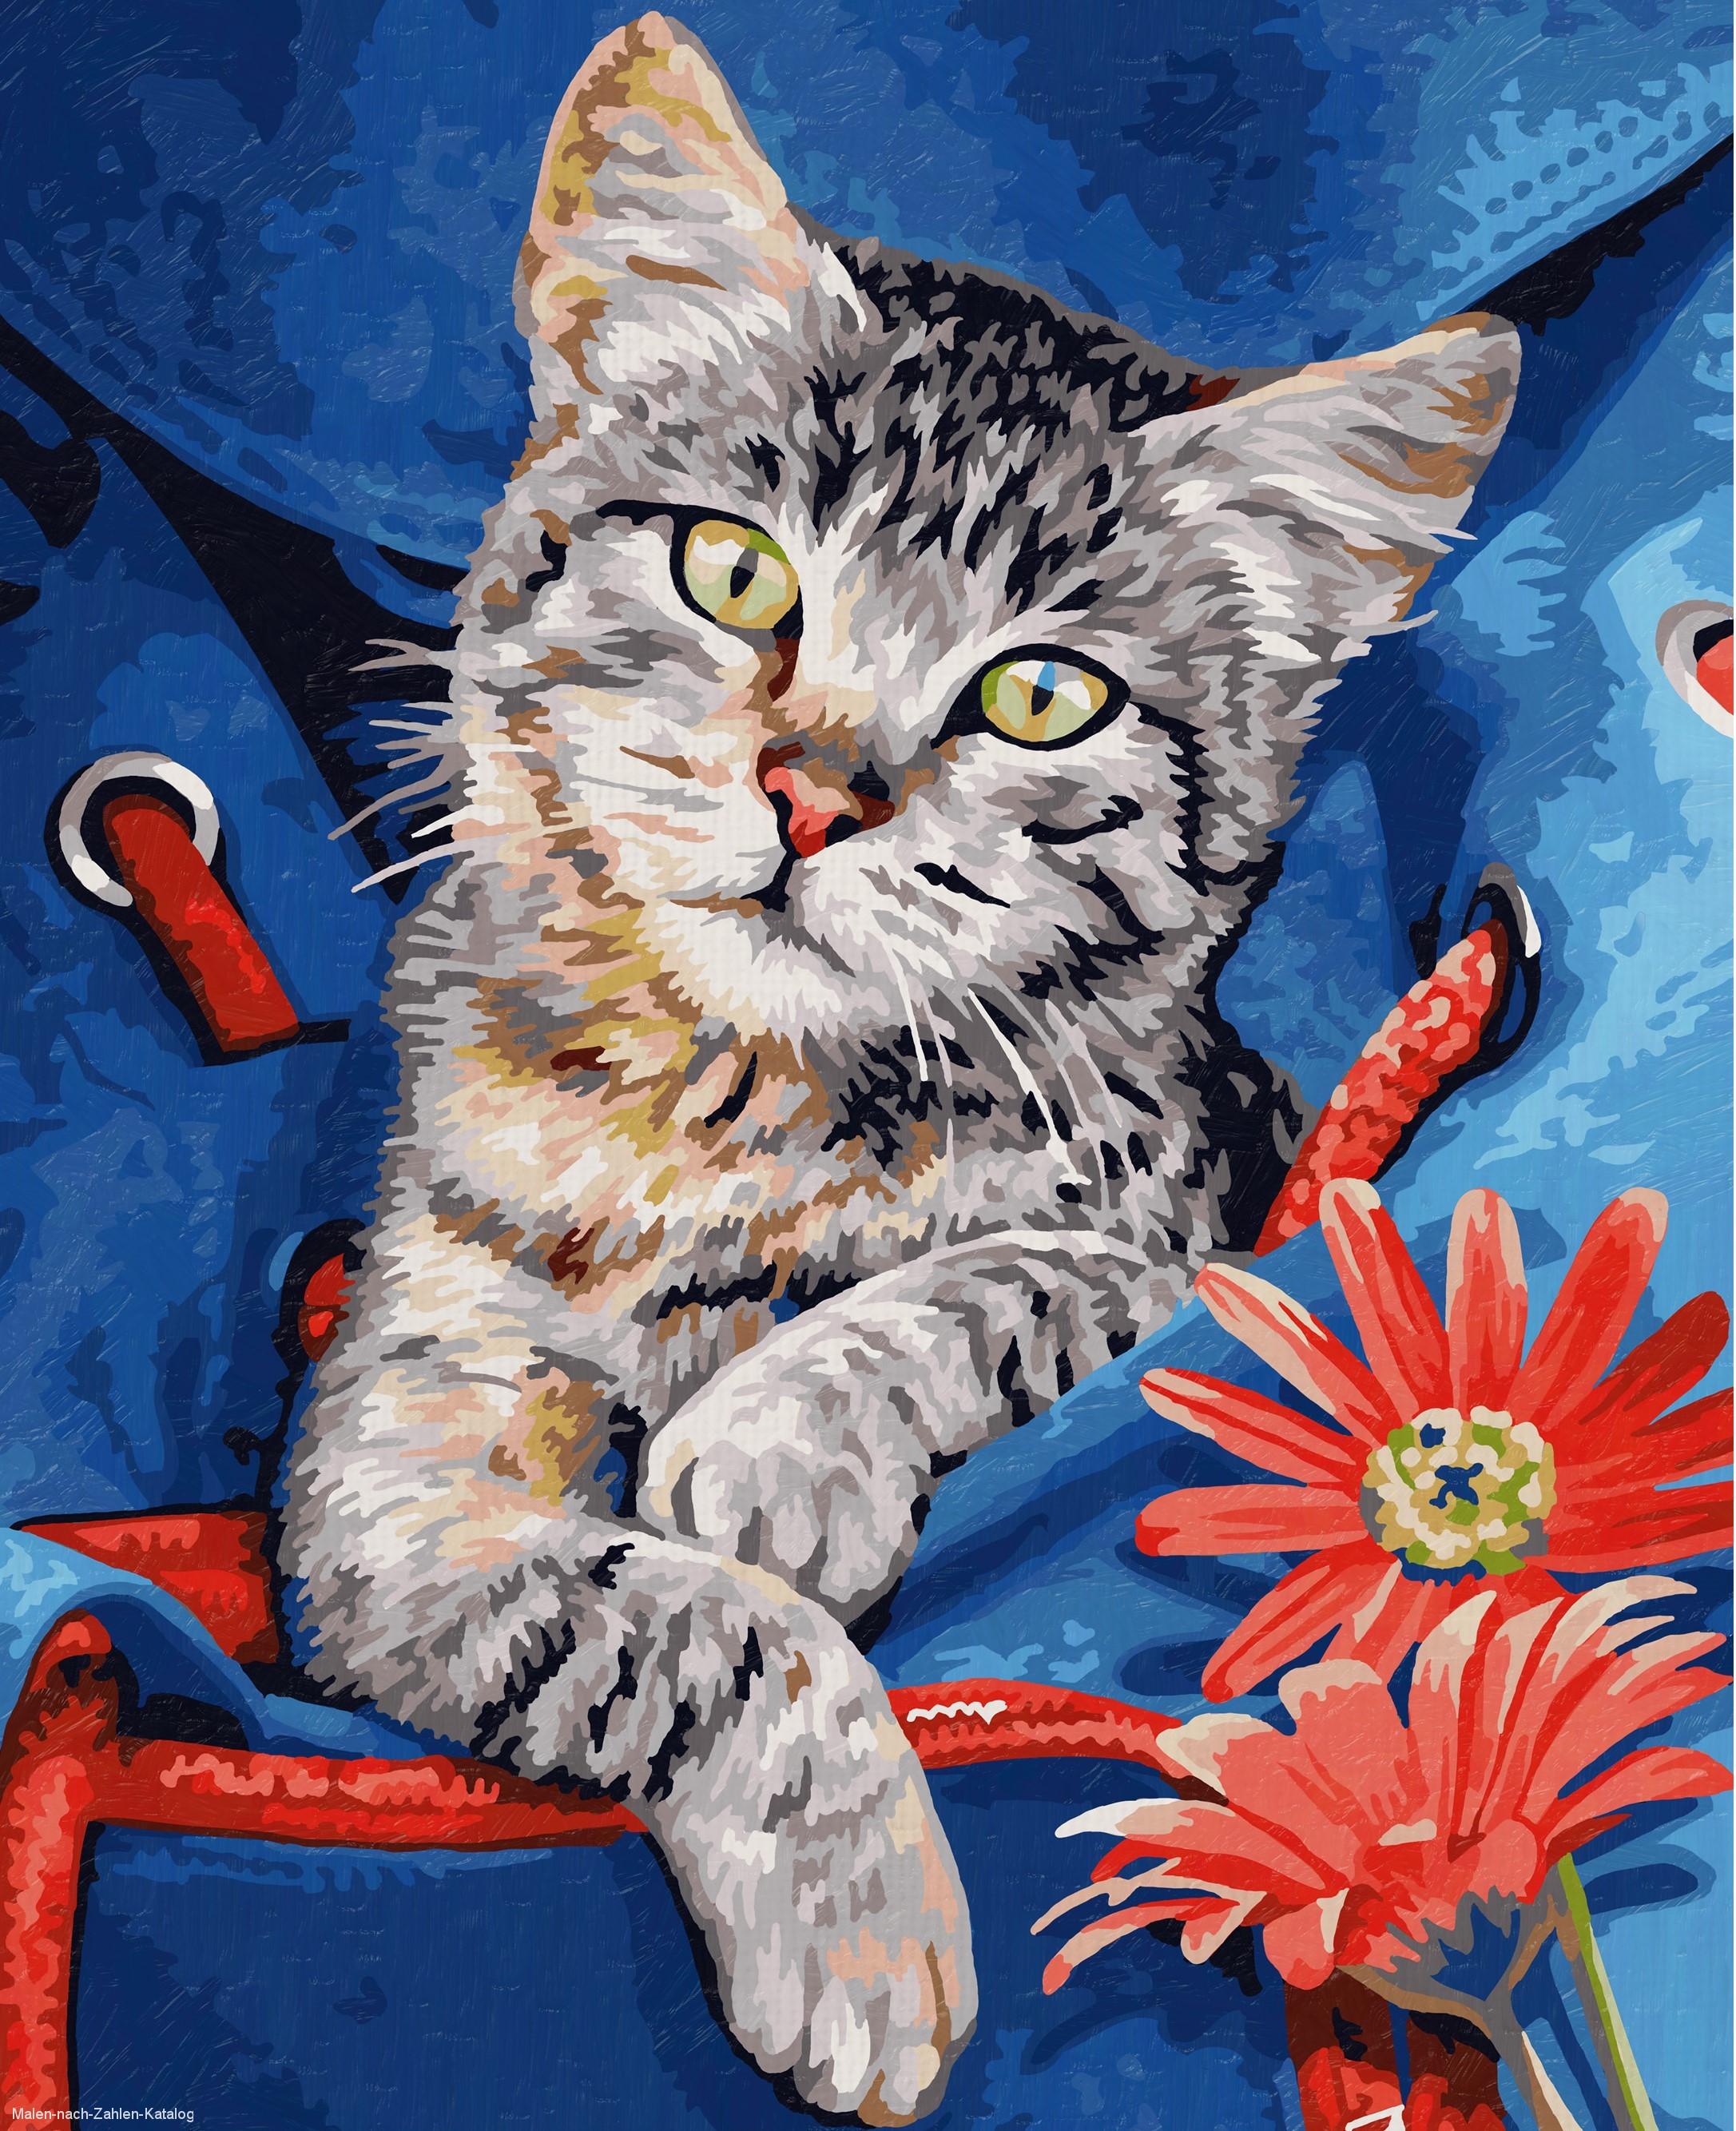 Schipper Malen nach Zahlen Klassiker 24 x 30 cm - Katze im Rucksack